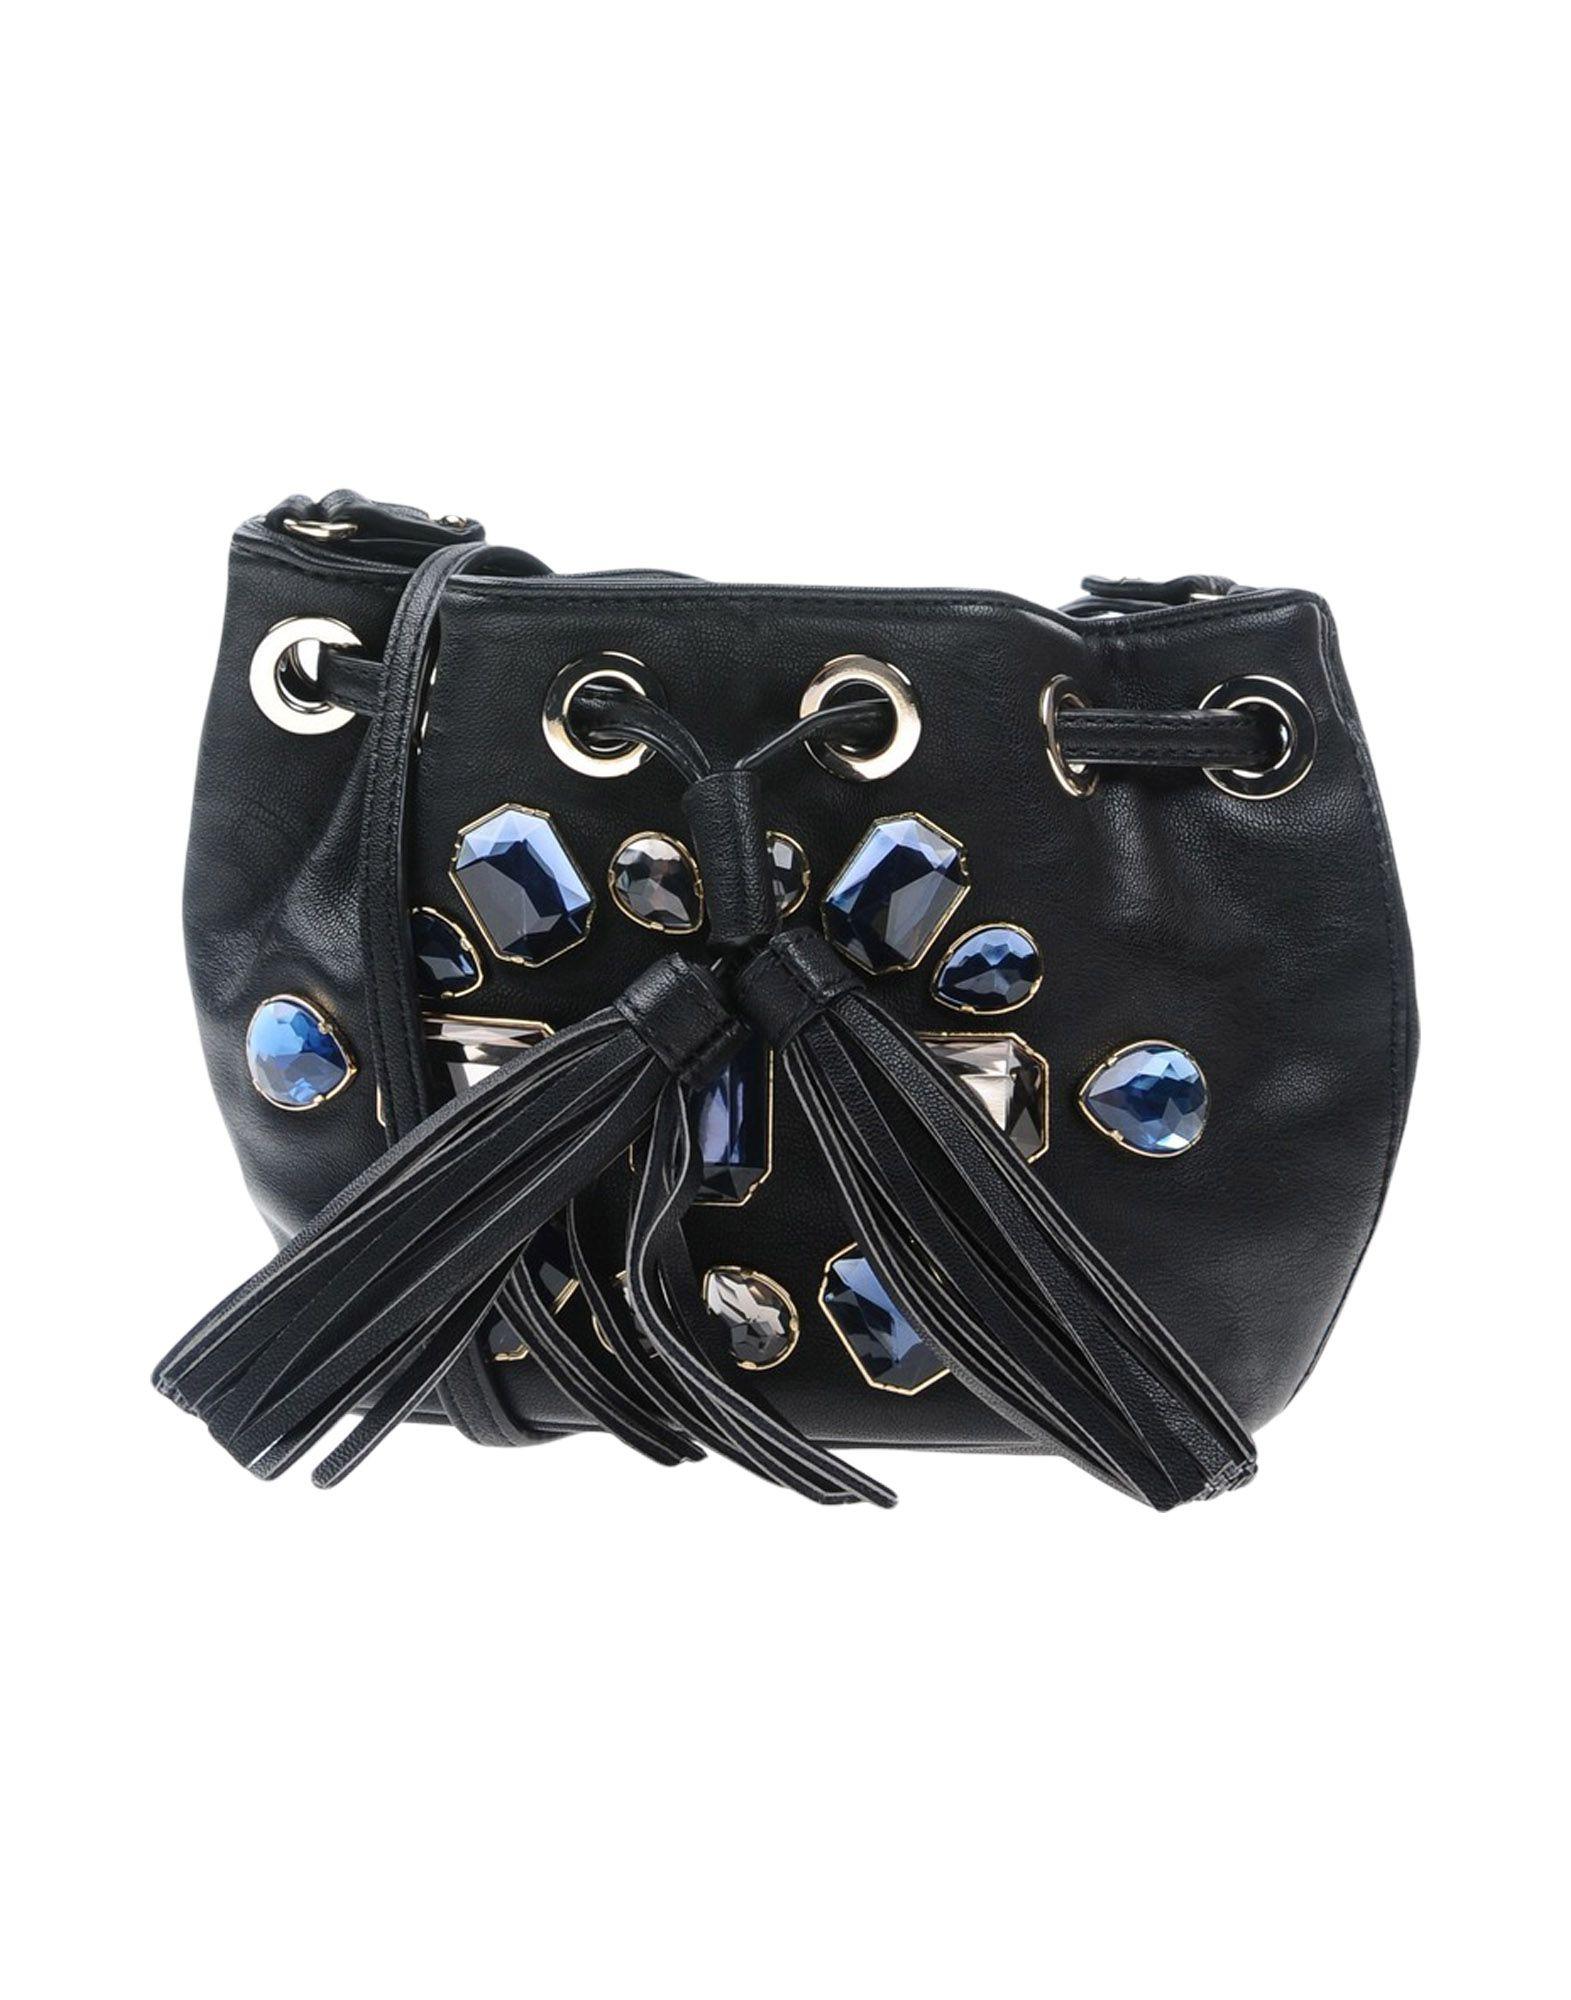 PATRIZIA PEPE Сумка через плечо сумка через плечо lightning 2015 crossbody hb004f